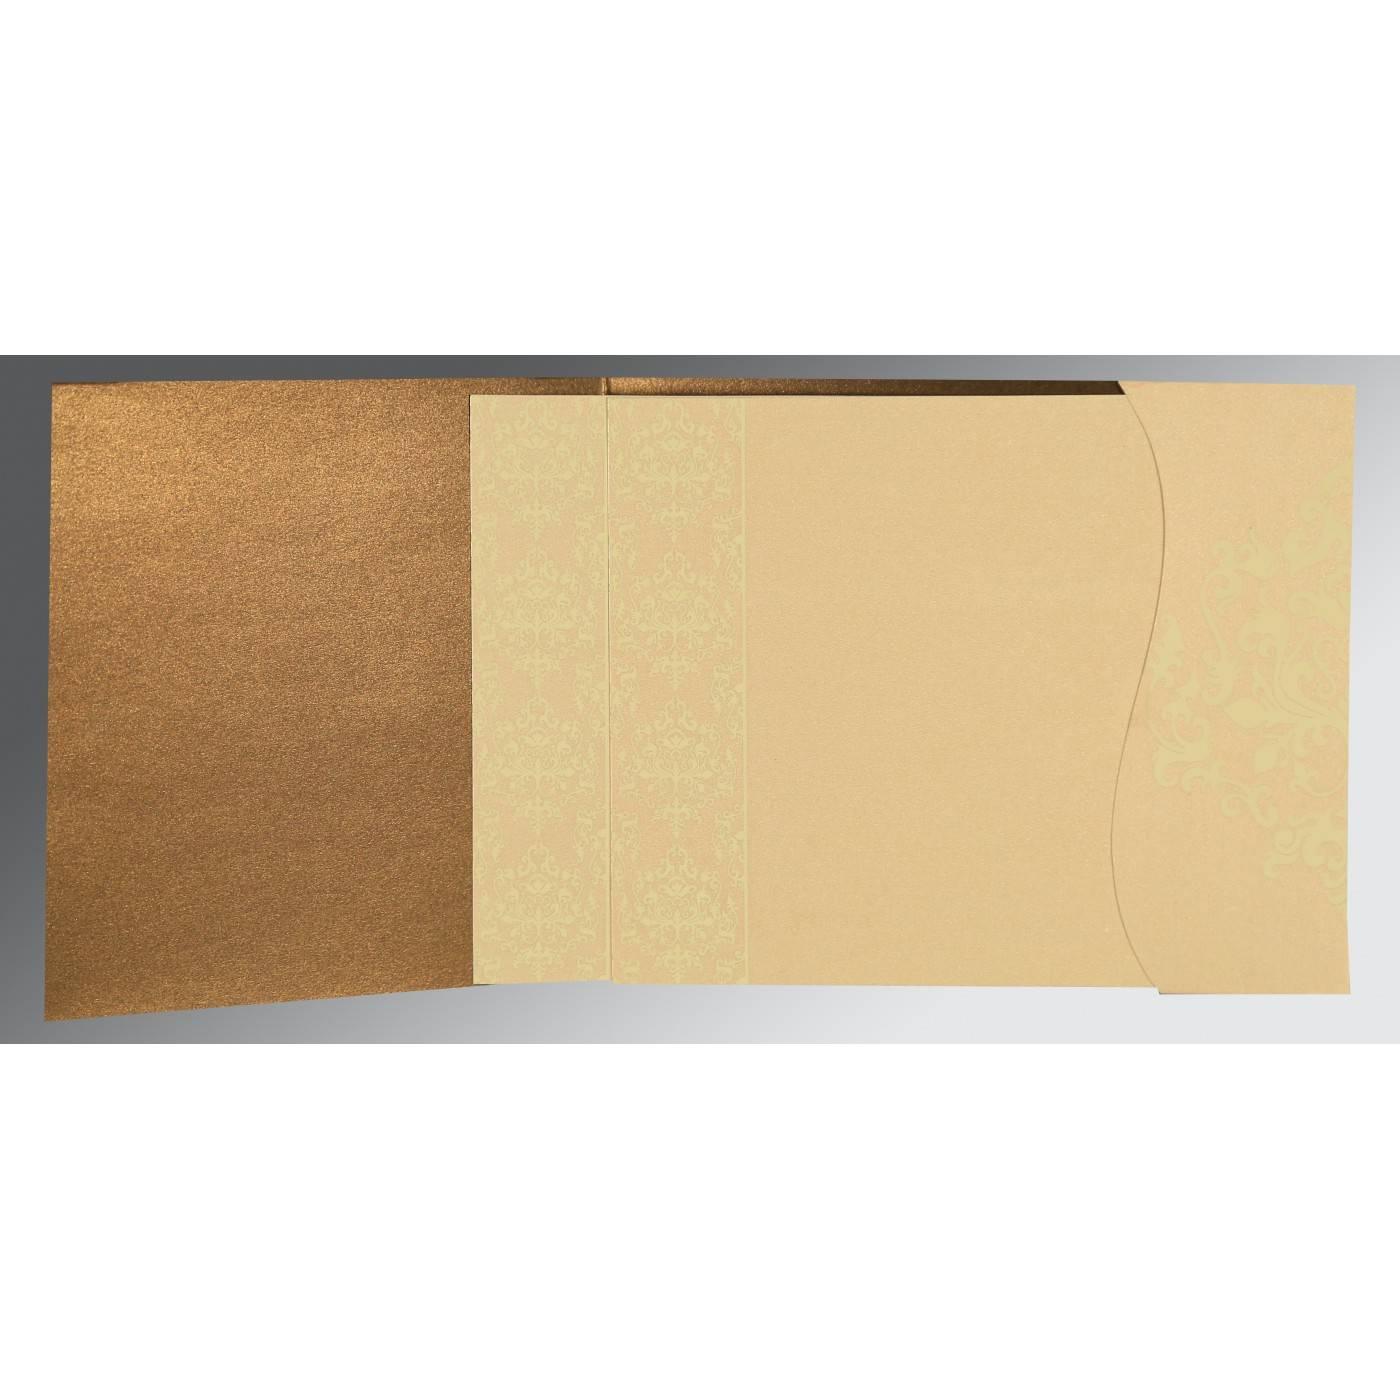 BROWN SHIMMERY DAMASK THEMED - SCREEN PRINTED WEDDING CARD : CRU-8253A - IndianWeddingCards